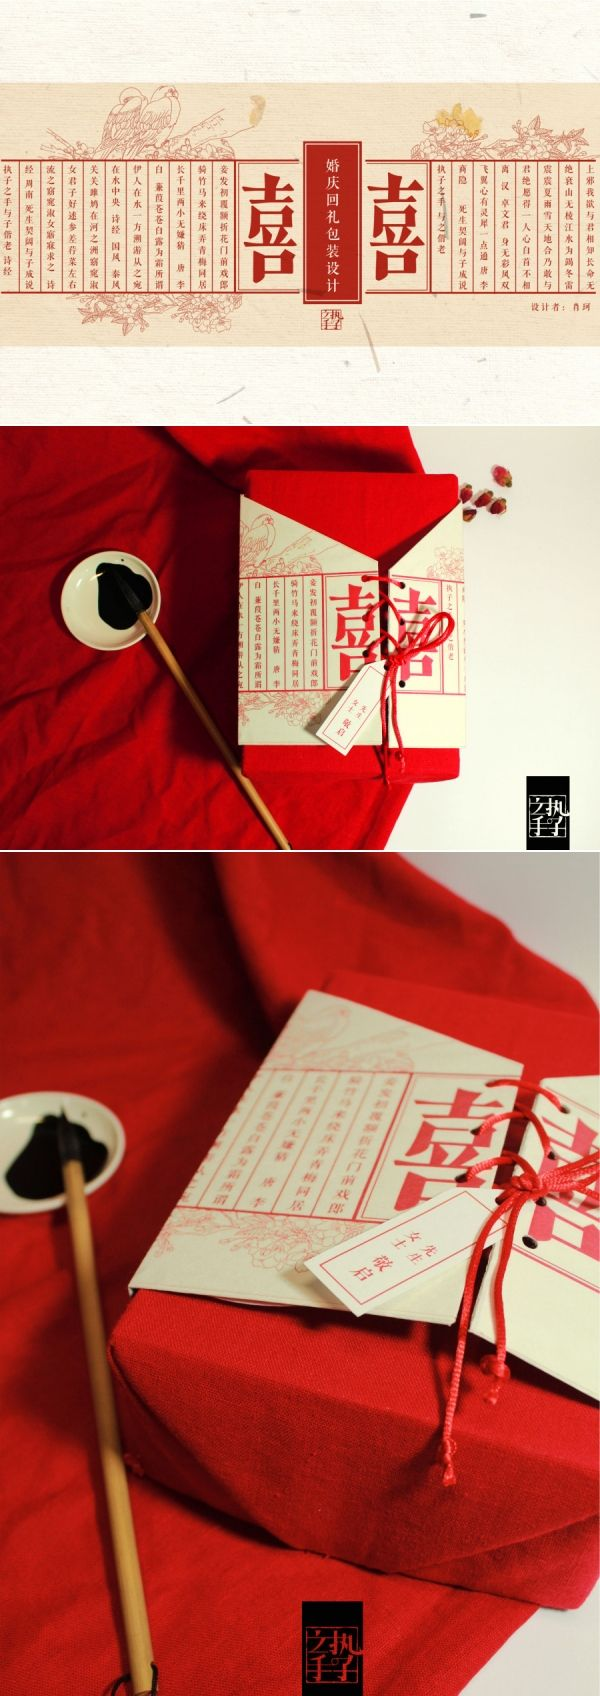 Great interpretation of oriental wedding packaging